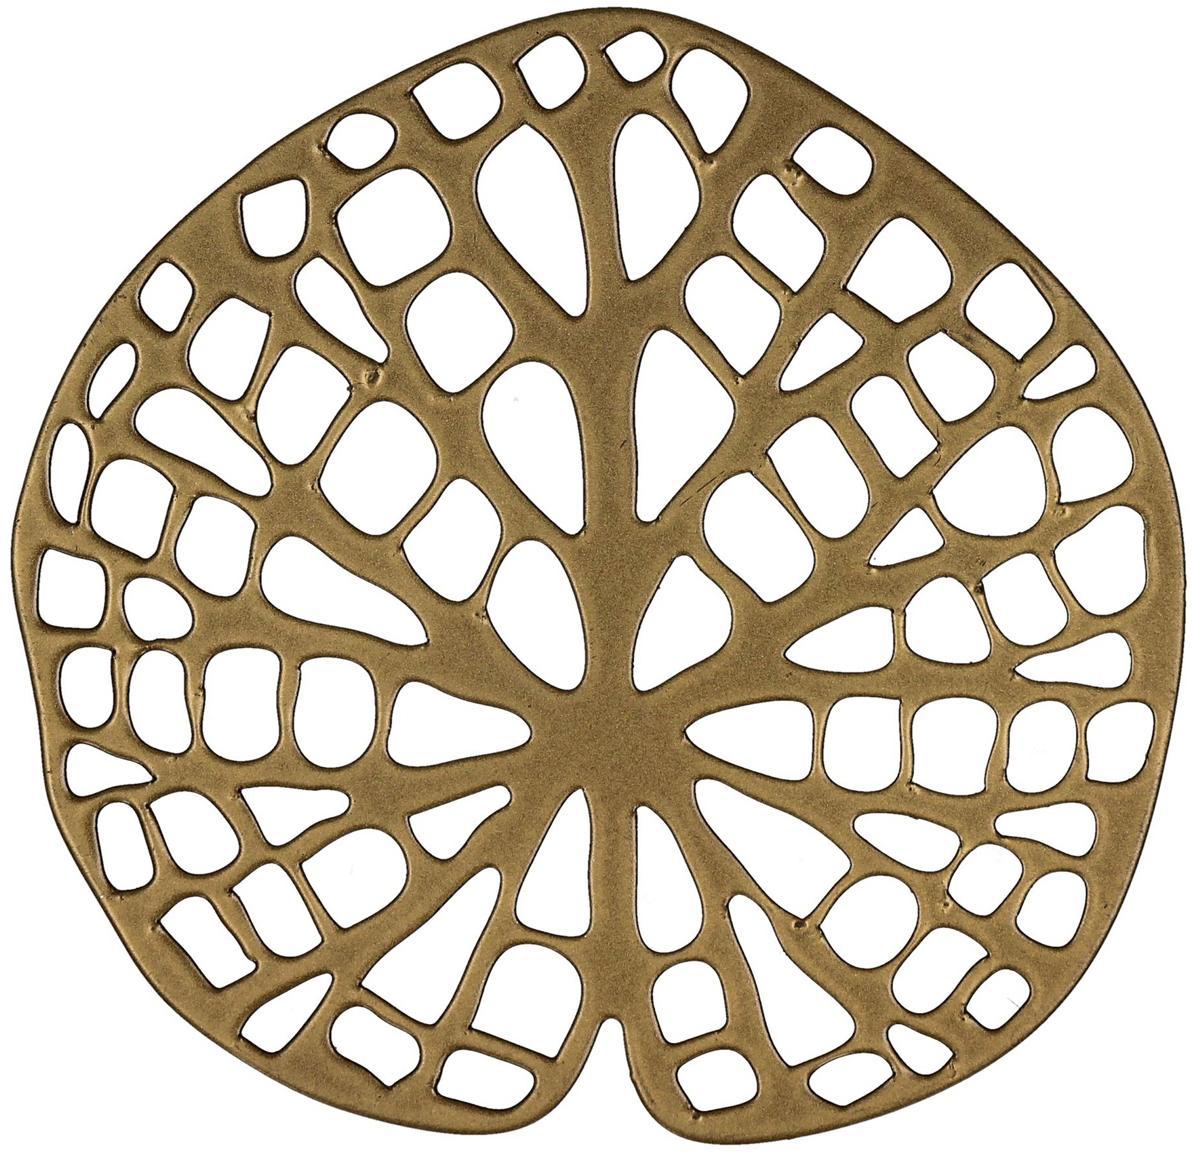 Posavasos Orient, 6uds., Metal, recubierto, Latón, An 12 x Al 1 cm